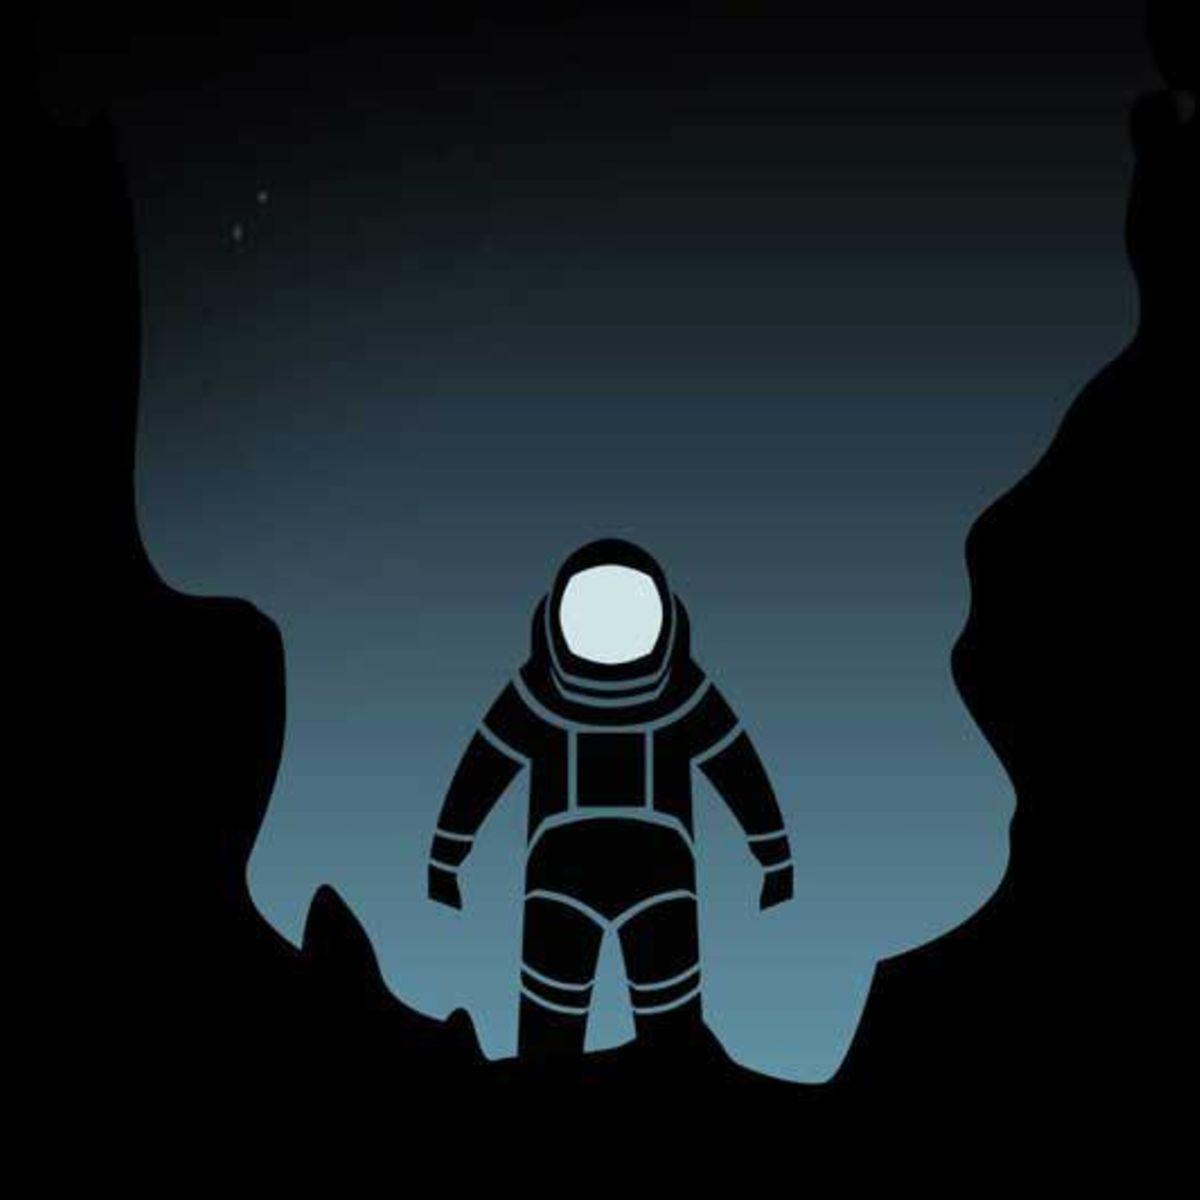 lifeline-ios-game_1.jpg